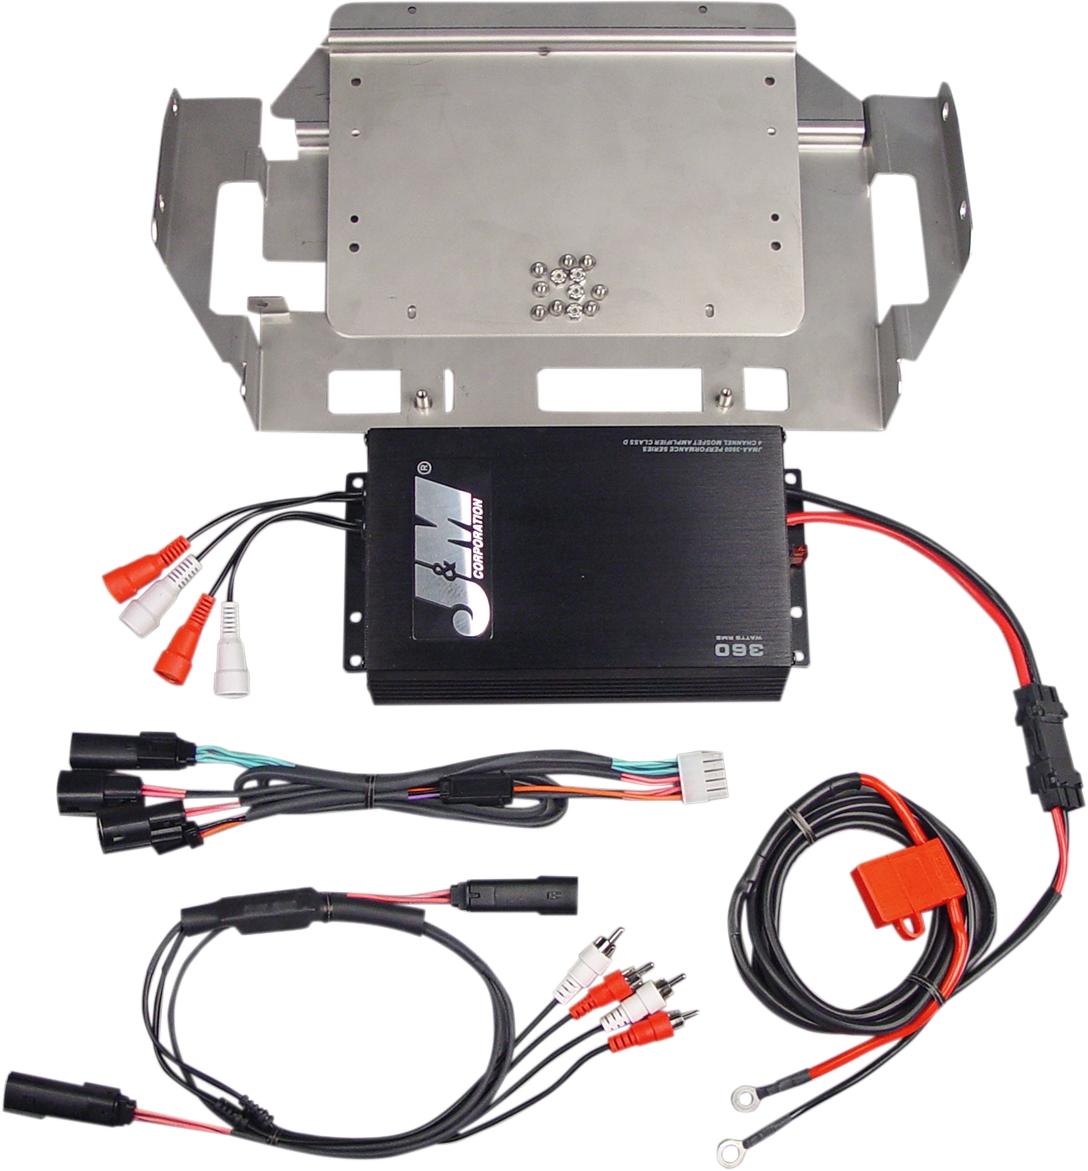 Performance Series 360W Four-Channel Amplifier Kit